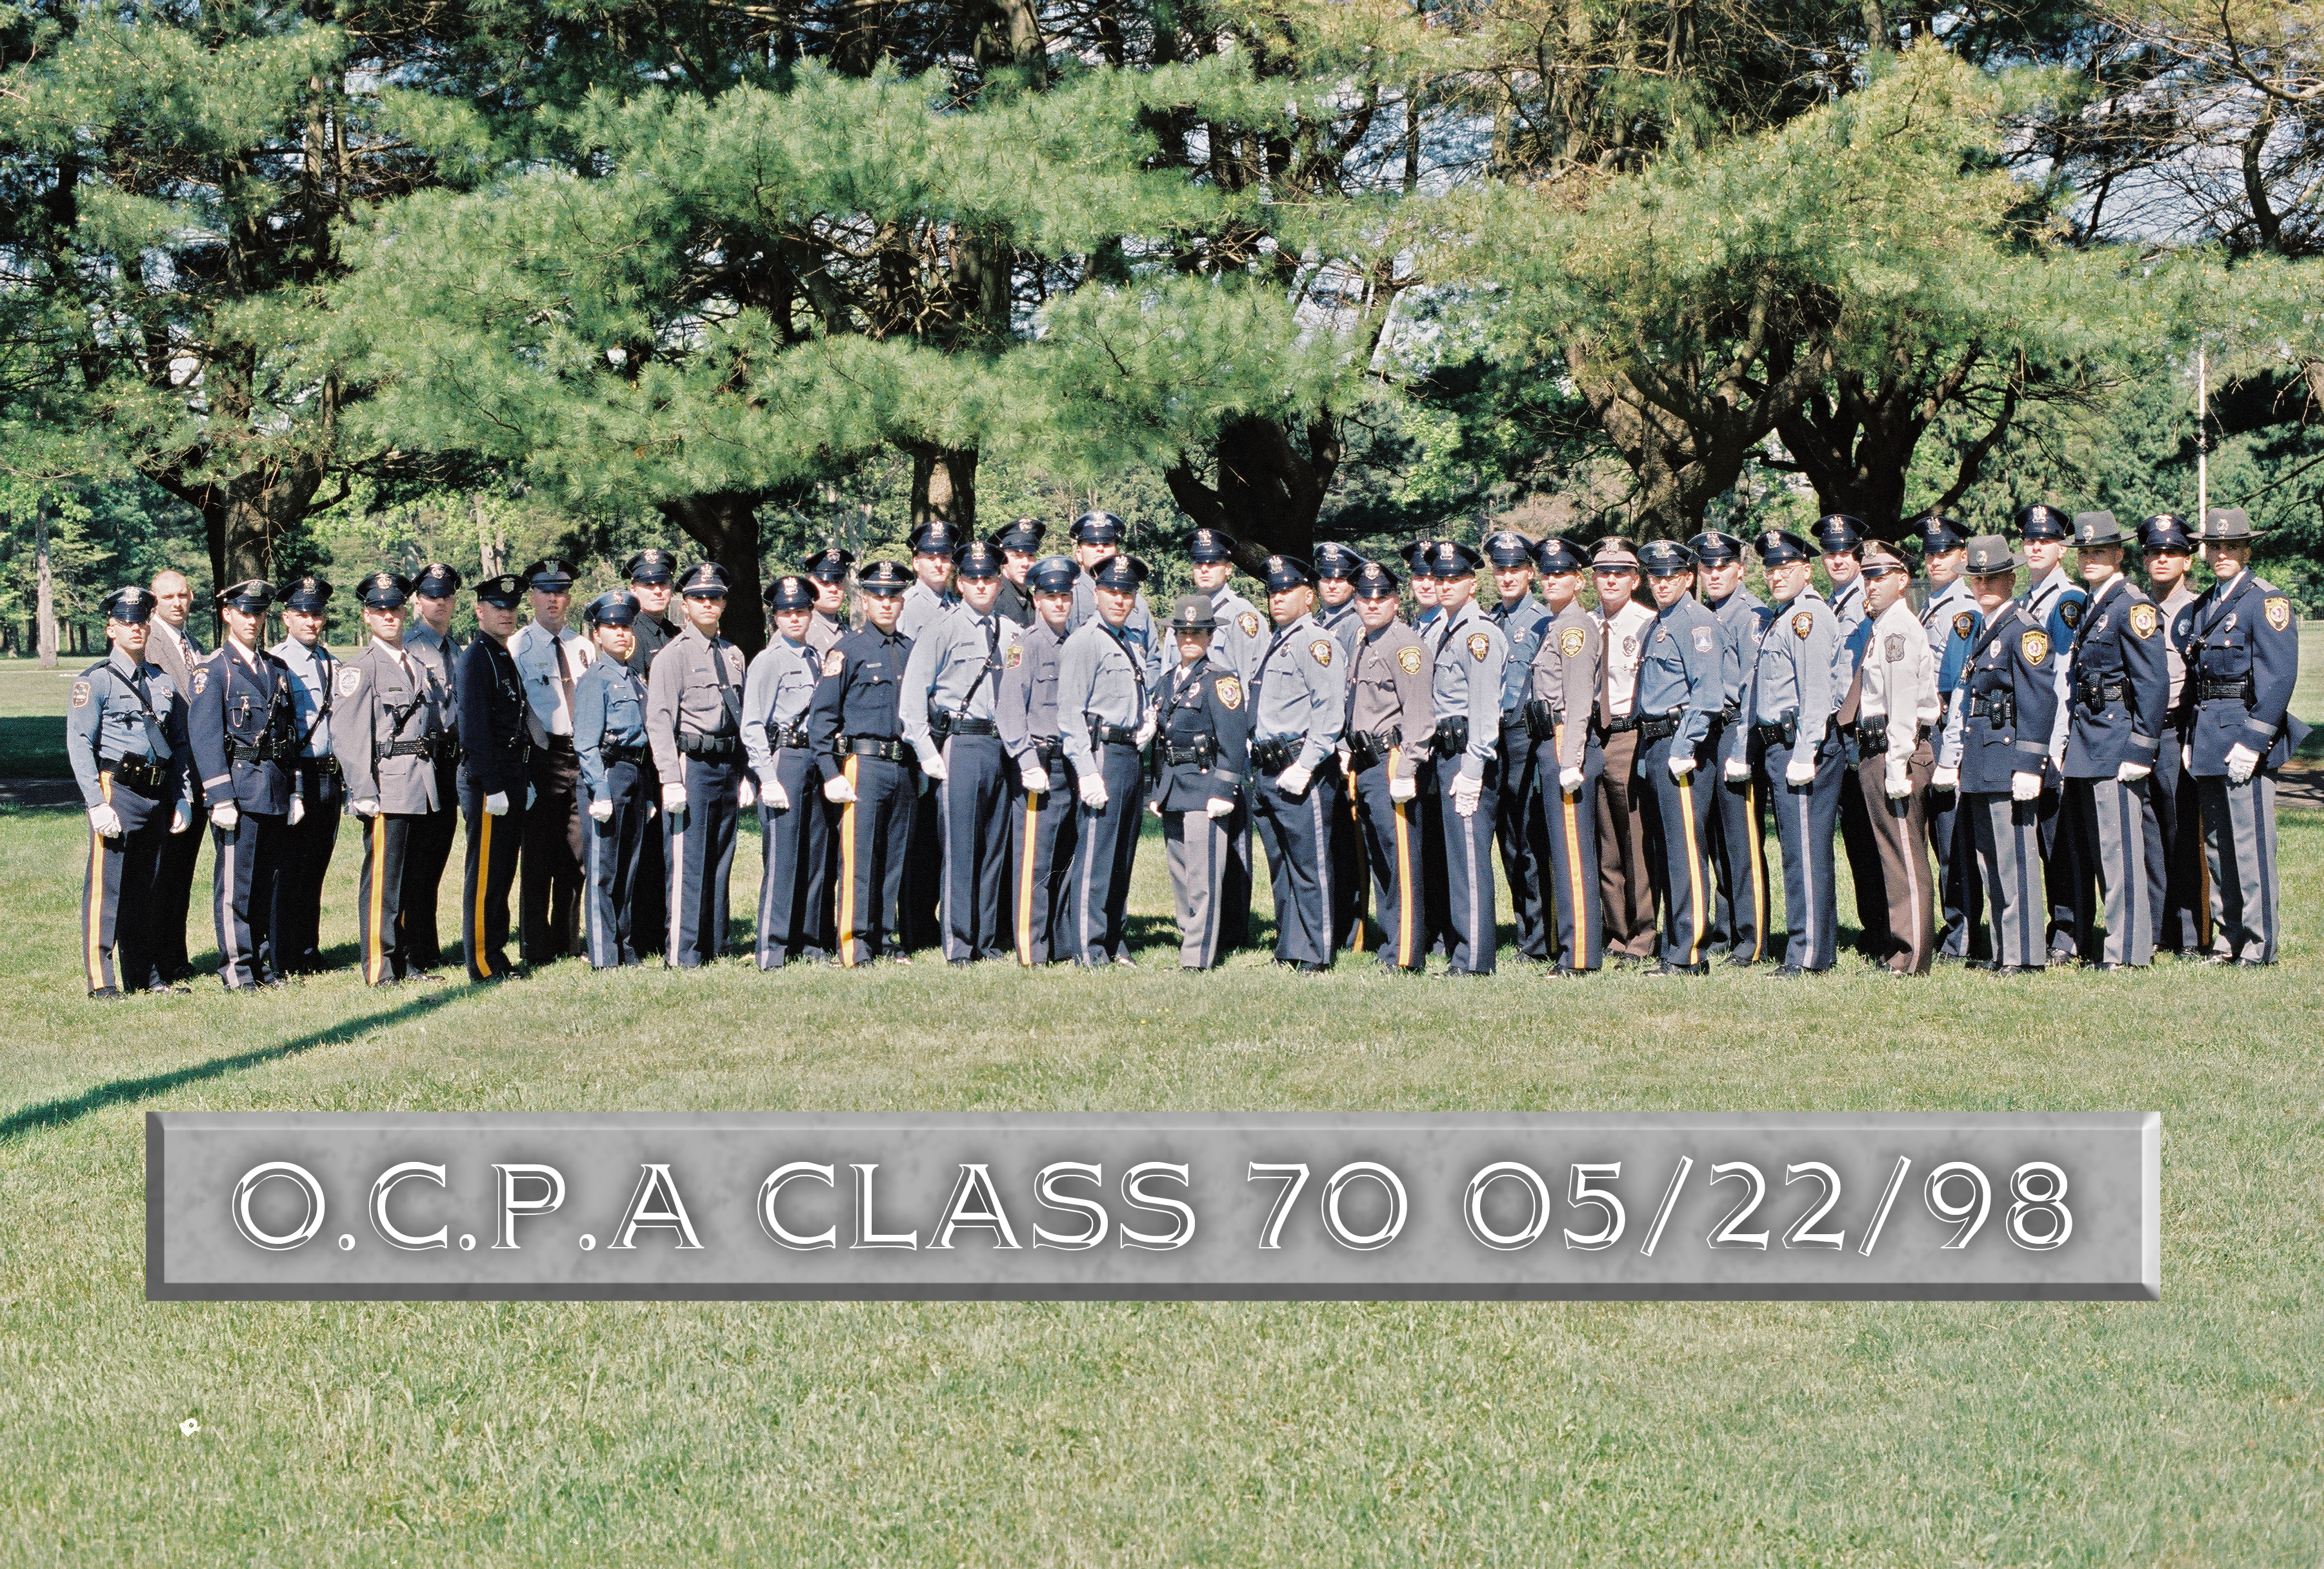 Class #70